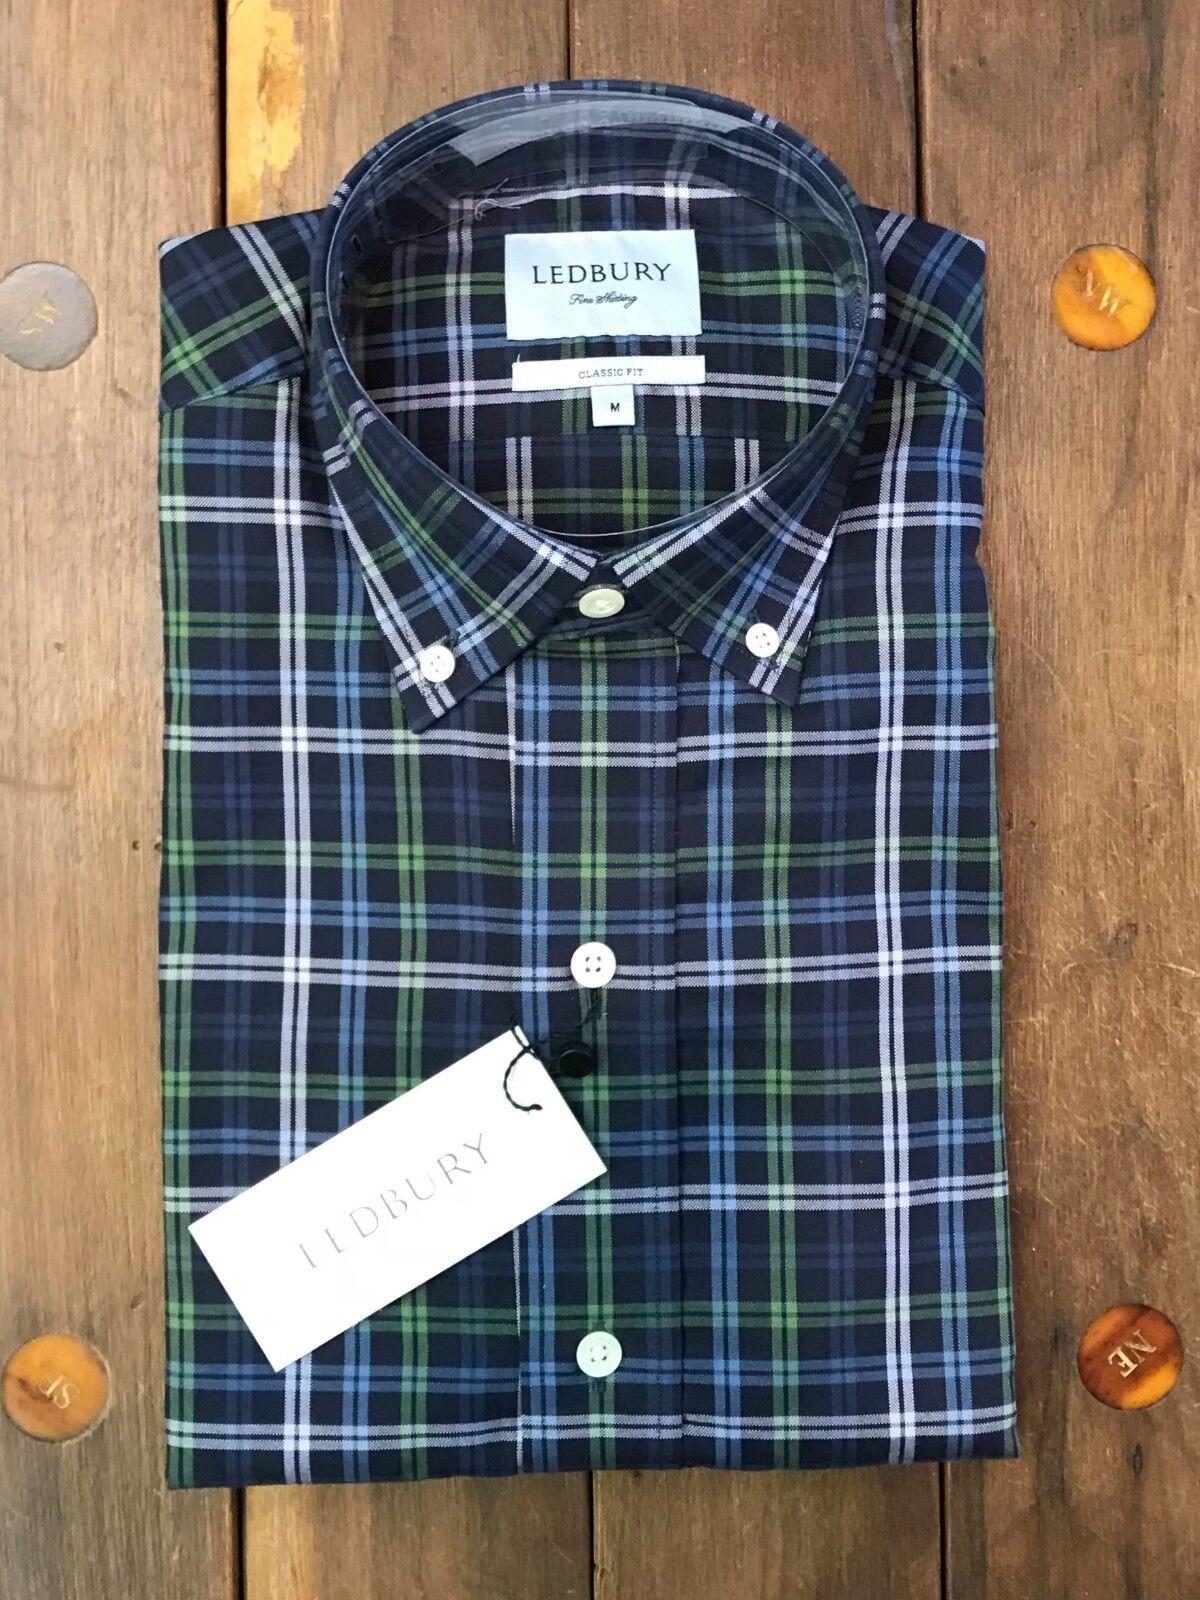 Ledbury Sport Shirt - The Knapp Oxford - Classic Fit